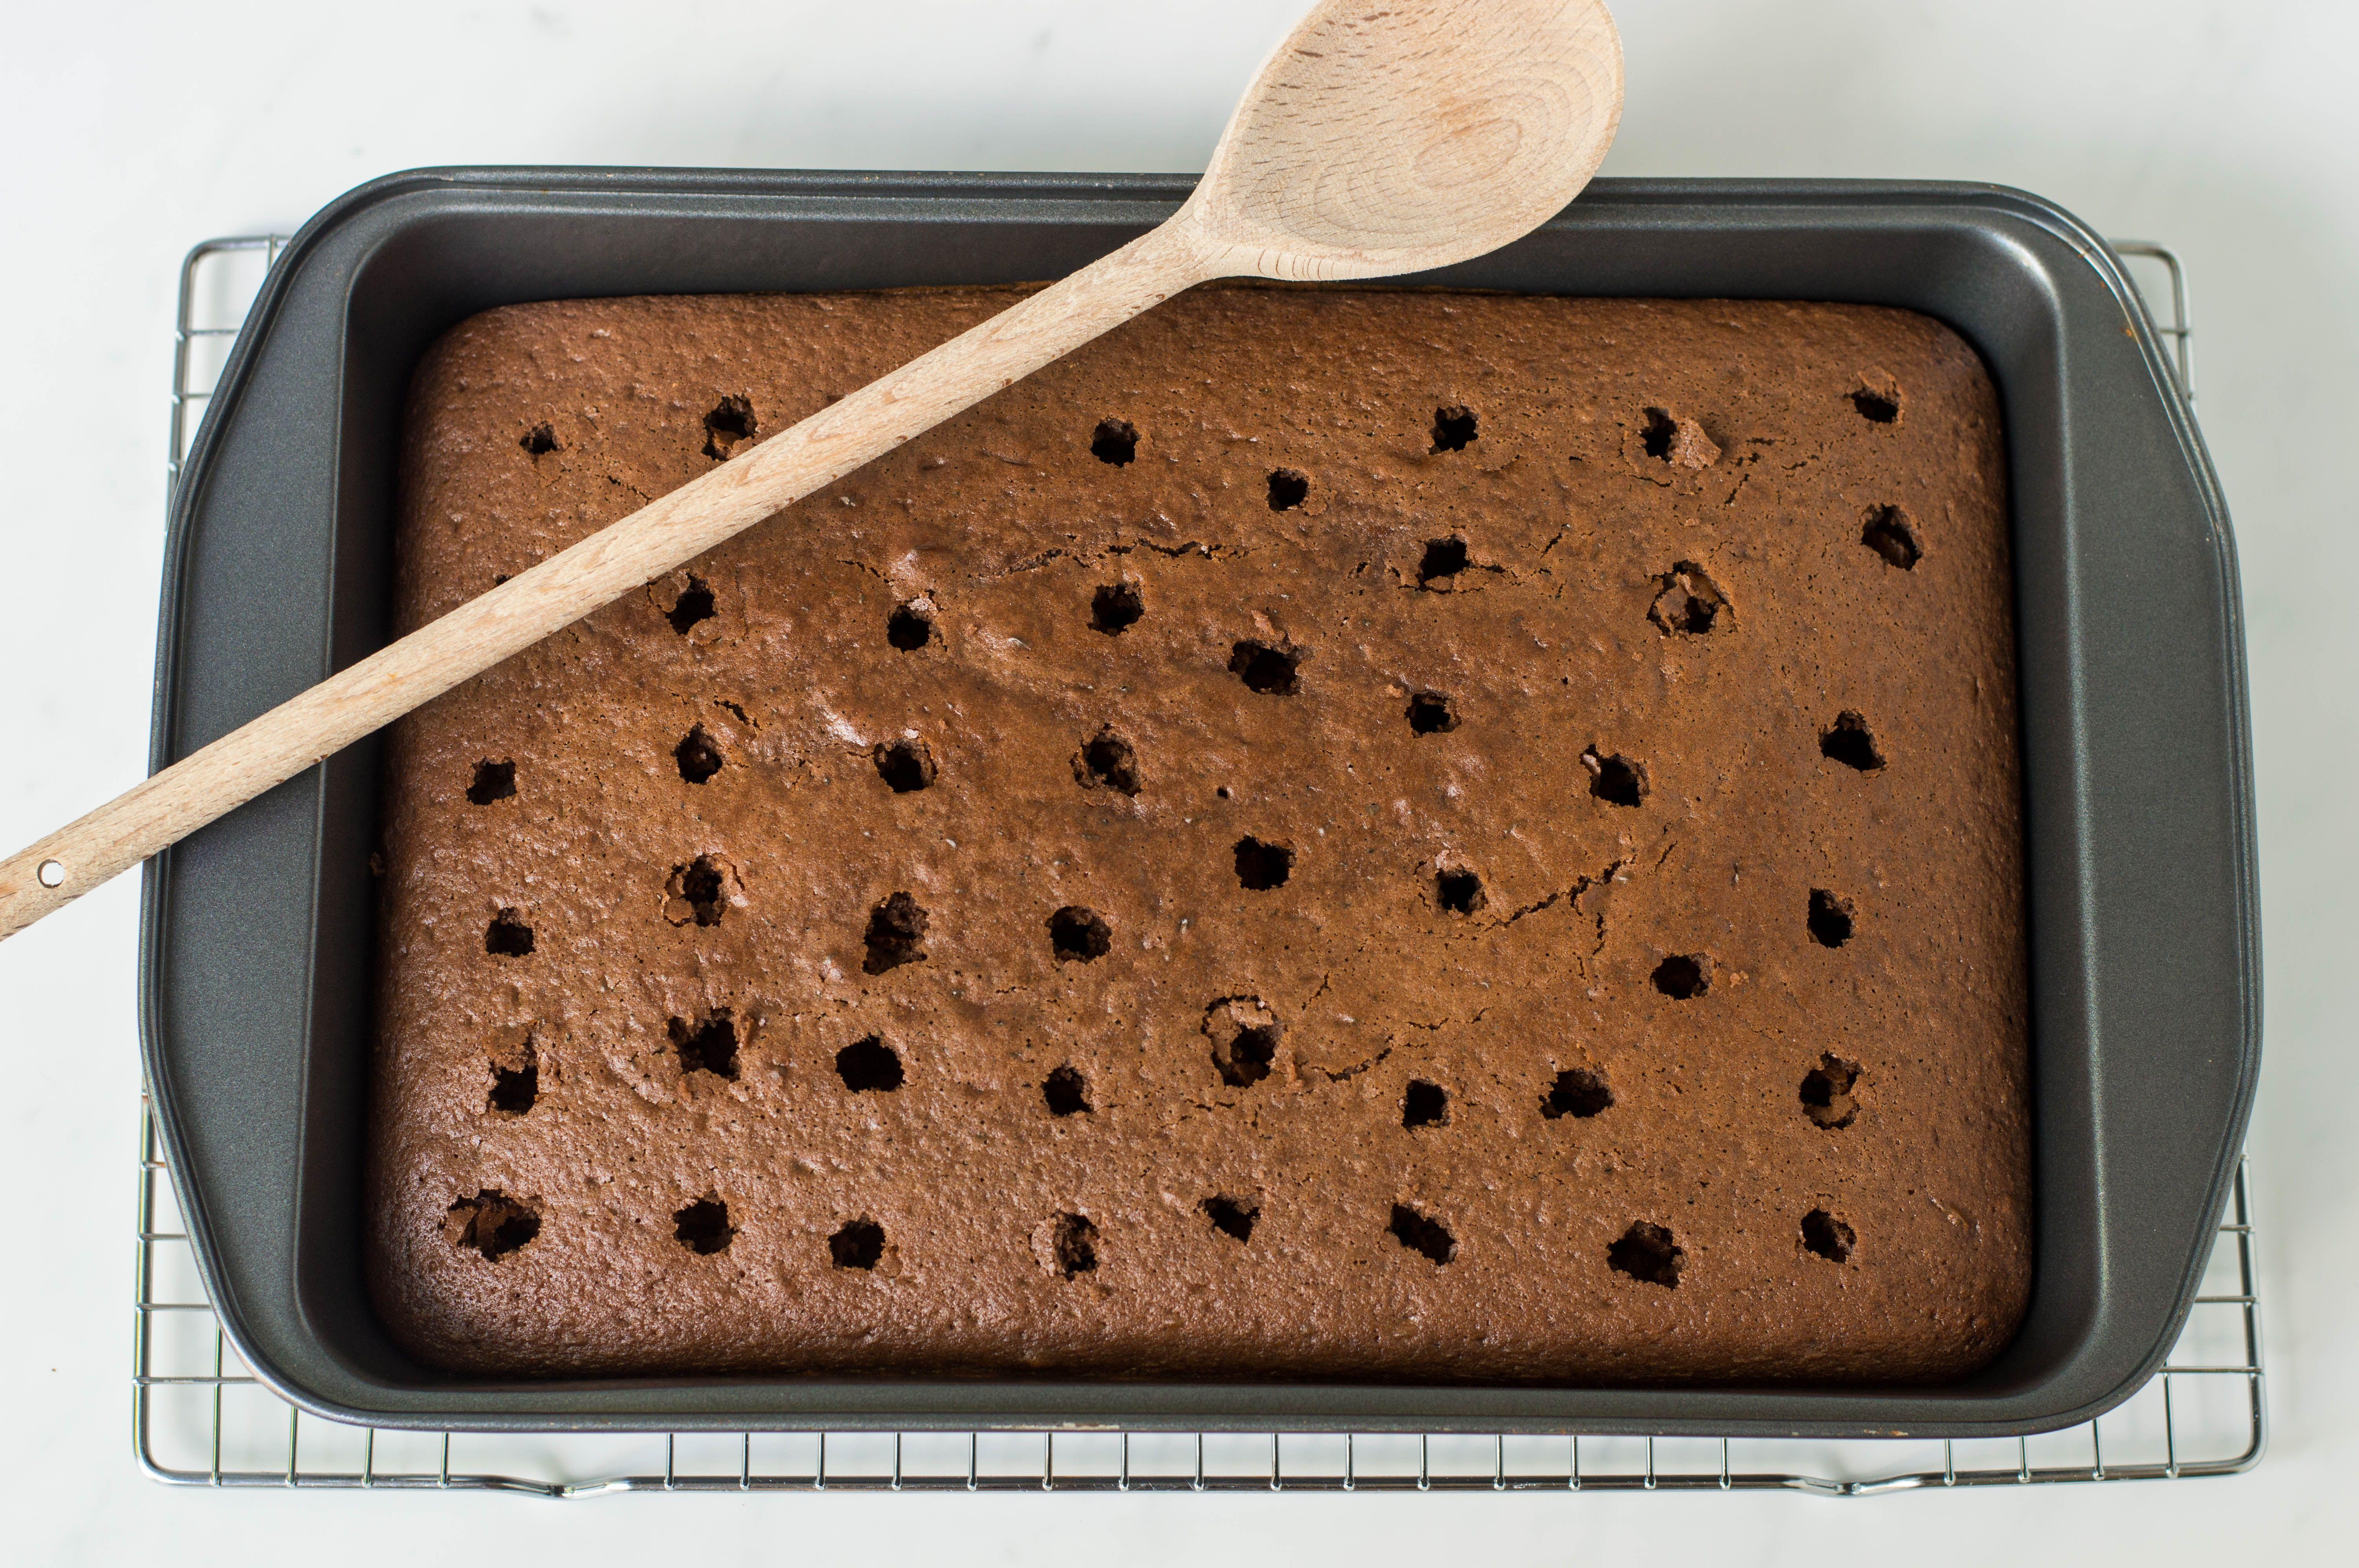 make holes in cake